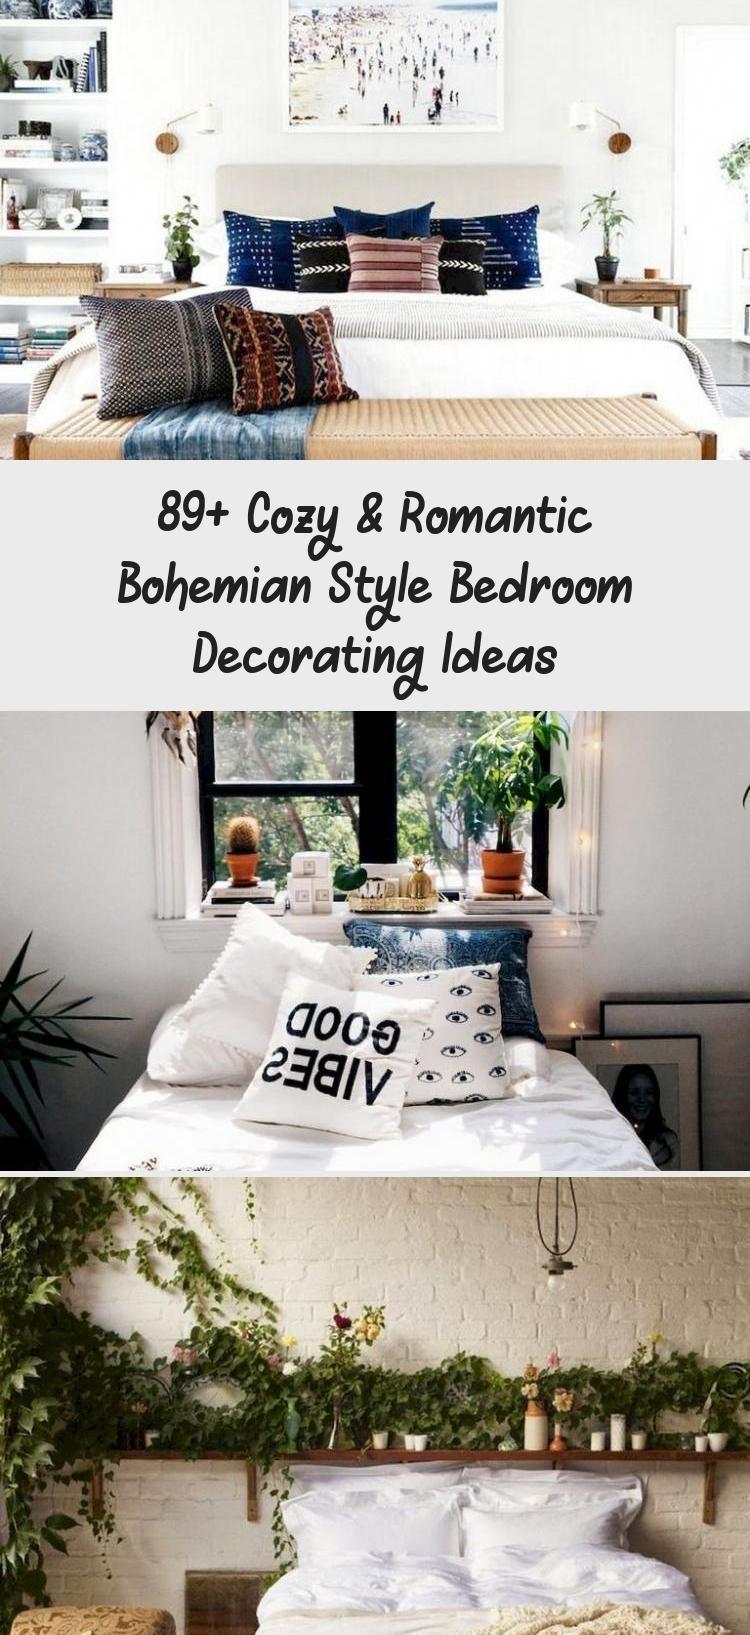 89 Cozy  Romantic Bohemian Style Bedroom Decorating Ideas  89 Cozy  Romantic Bohemian Style Bedroom Decorating Ideas